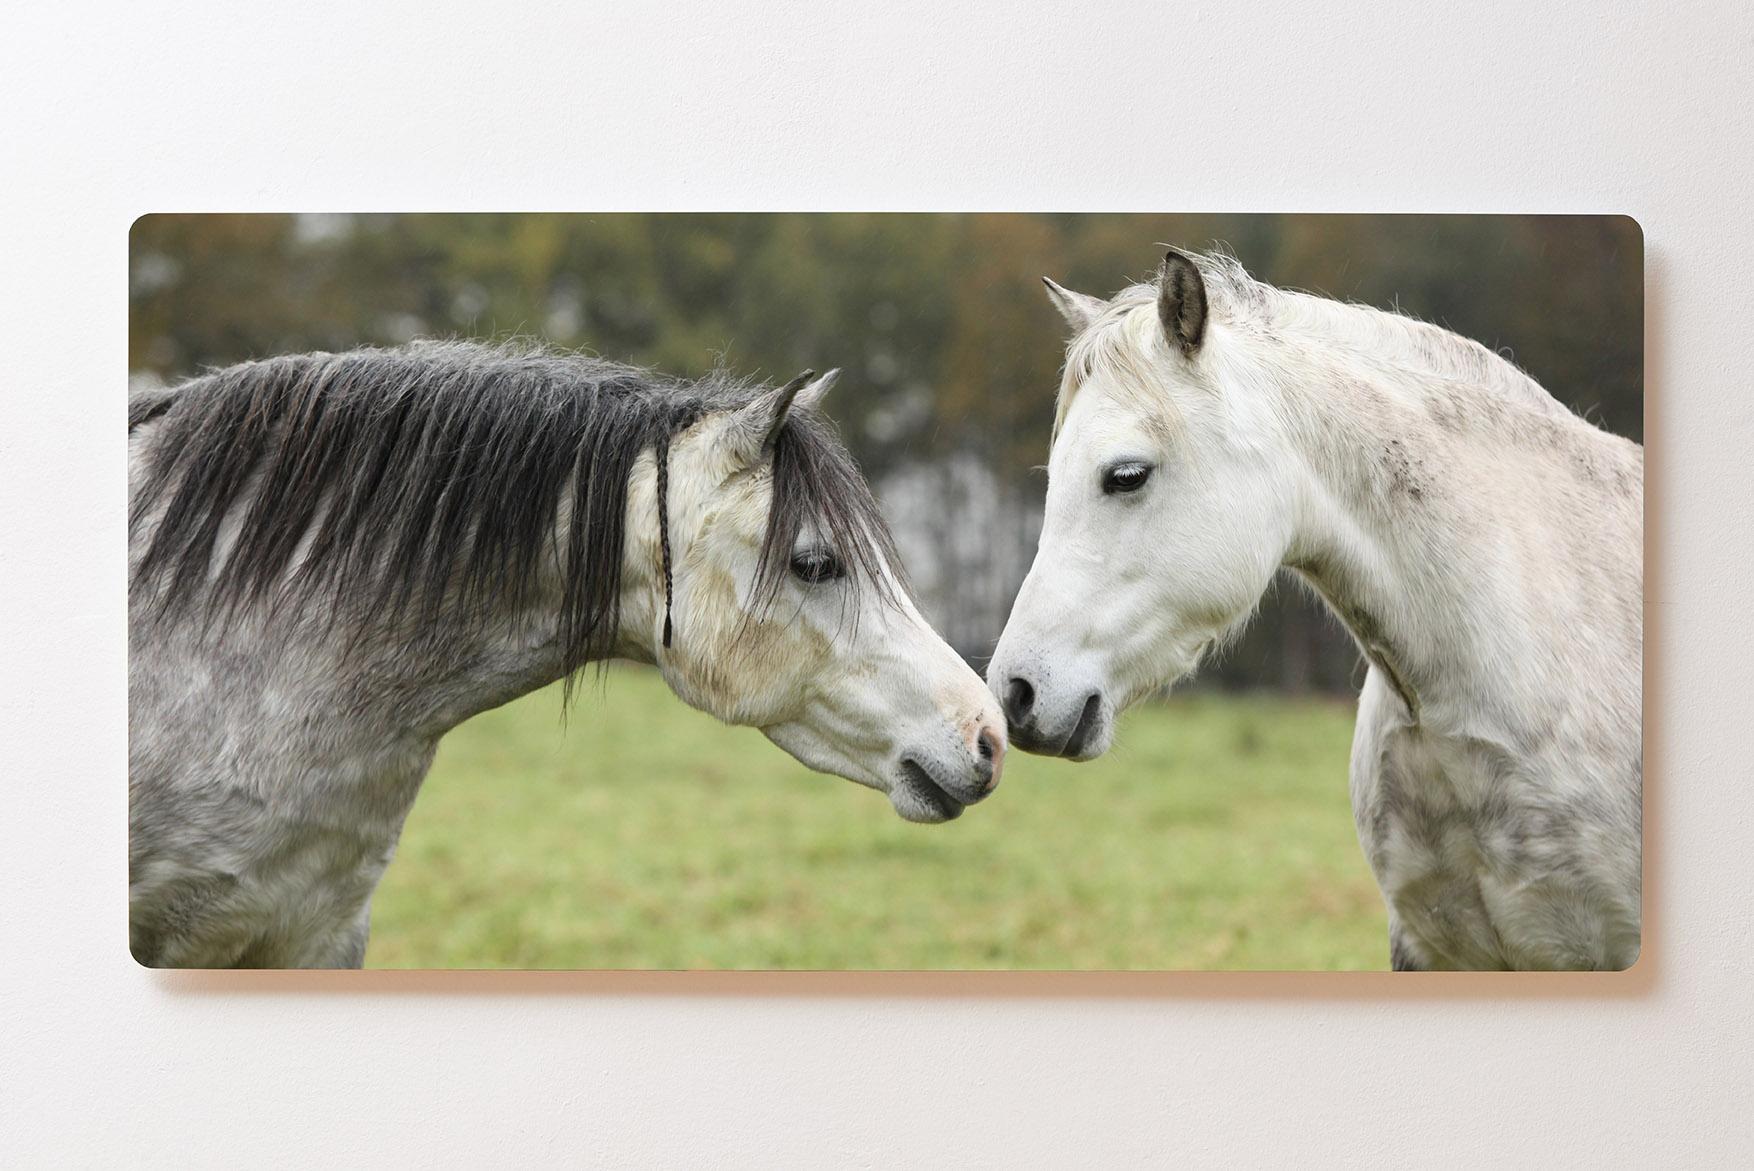 Magnettafel BACKLIGHT 120x60cm Motiv-Wandbild M101 Pferde